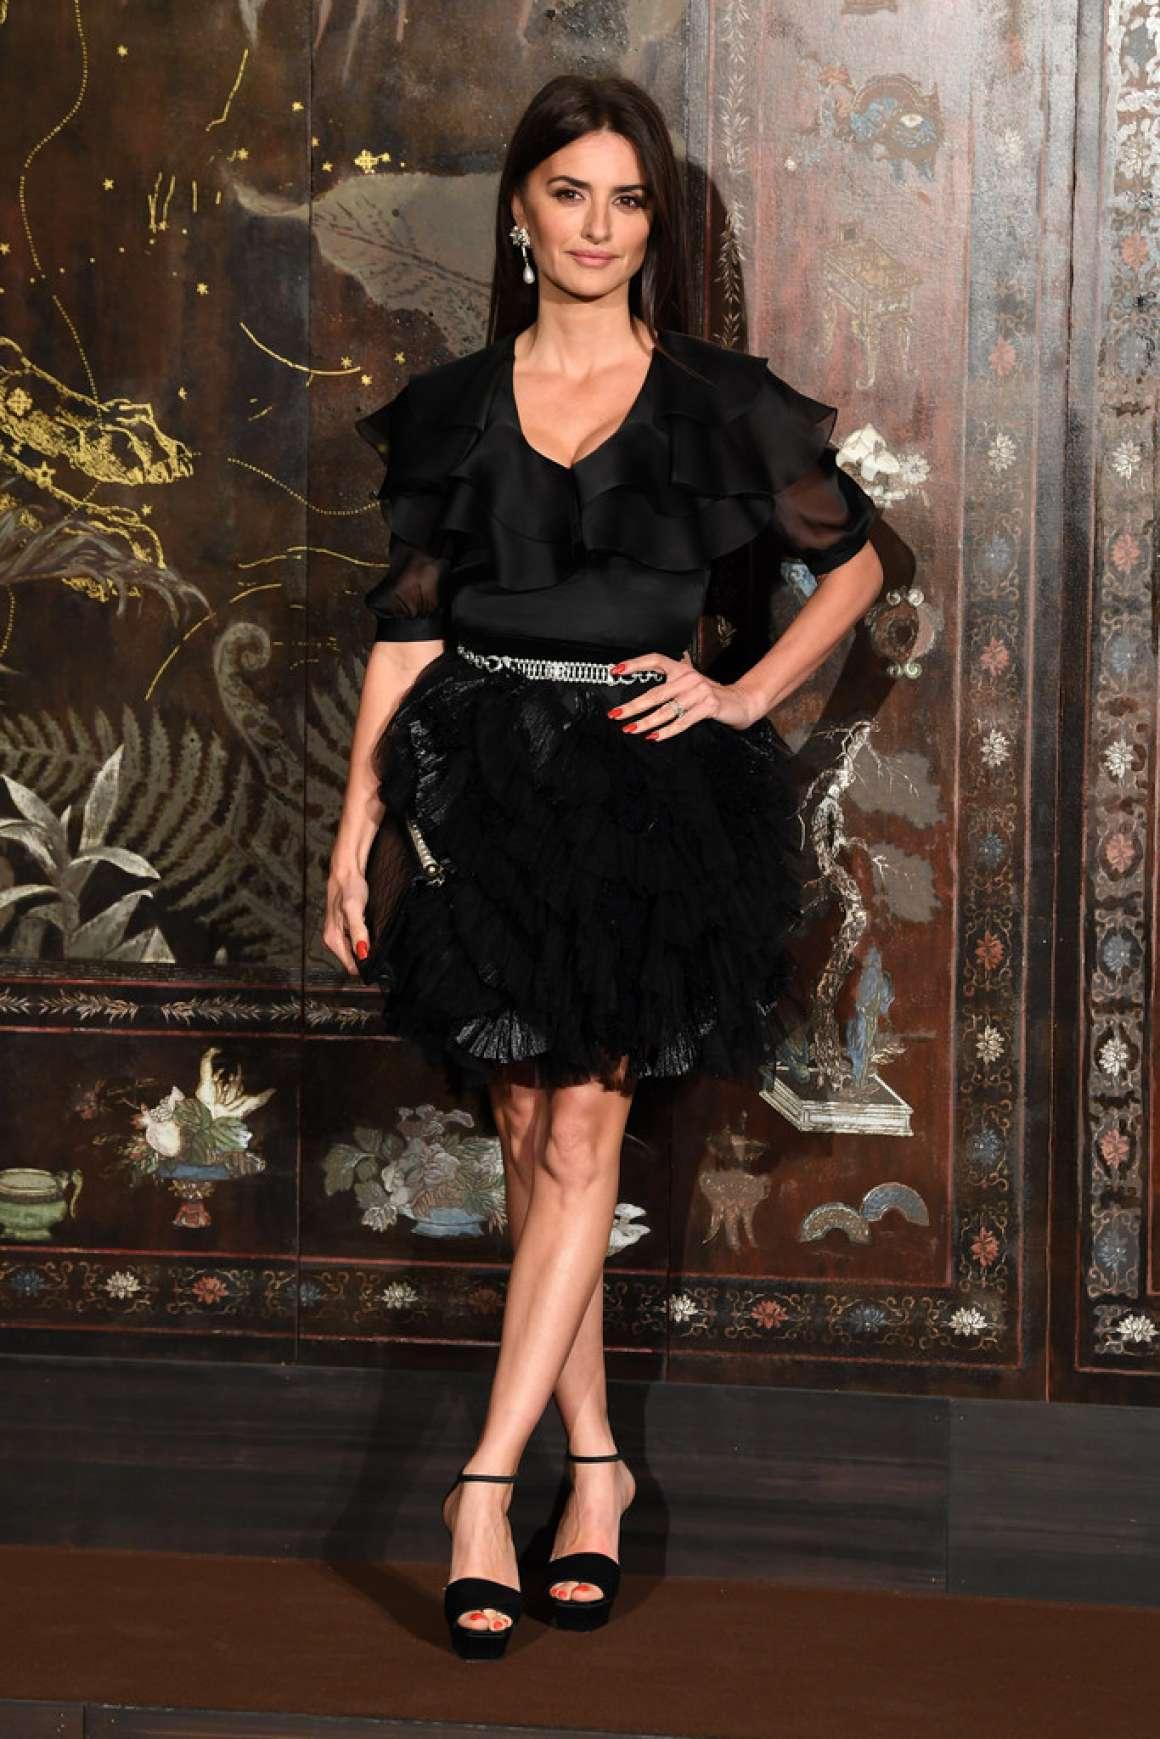 Penelope-Cruz---Chanel-Metiers-DArt-Fashion-Show-07.jpg